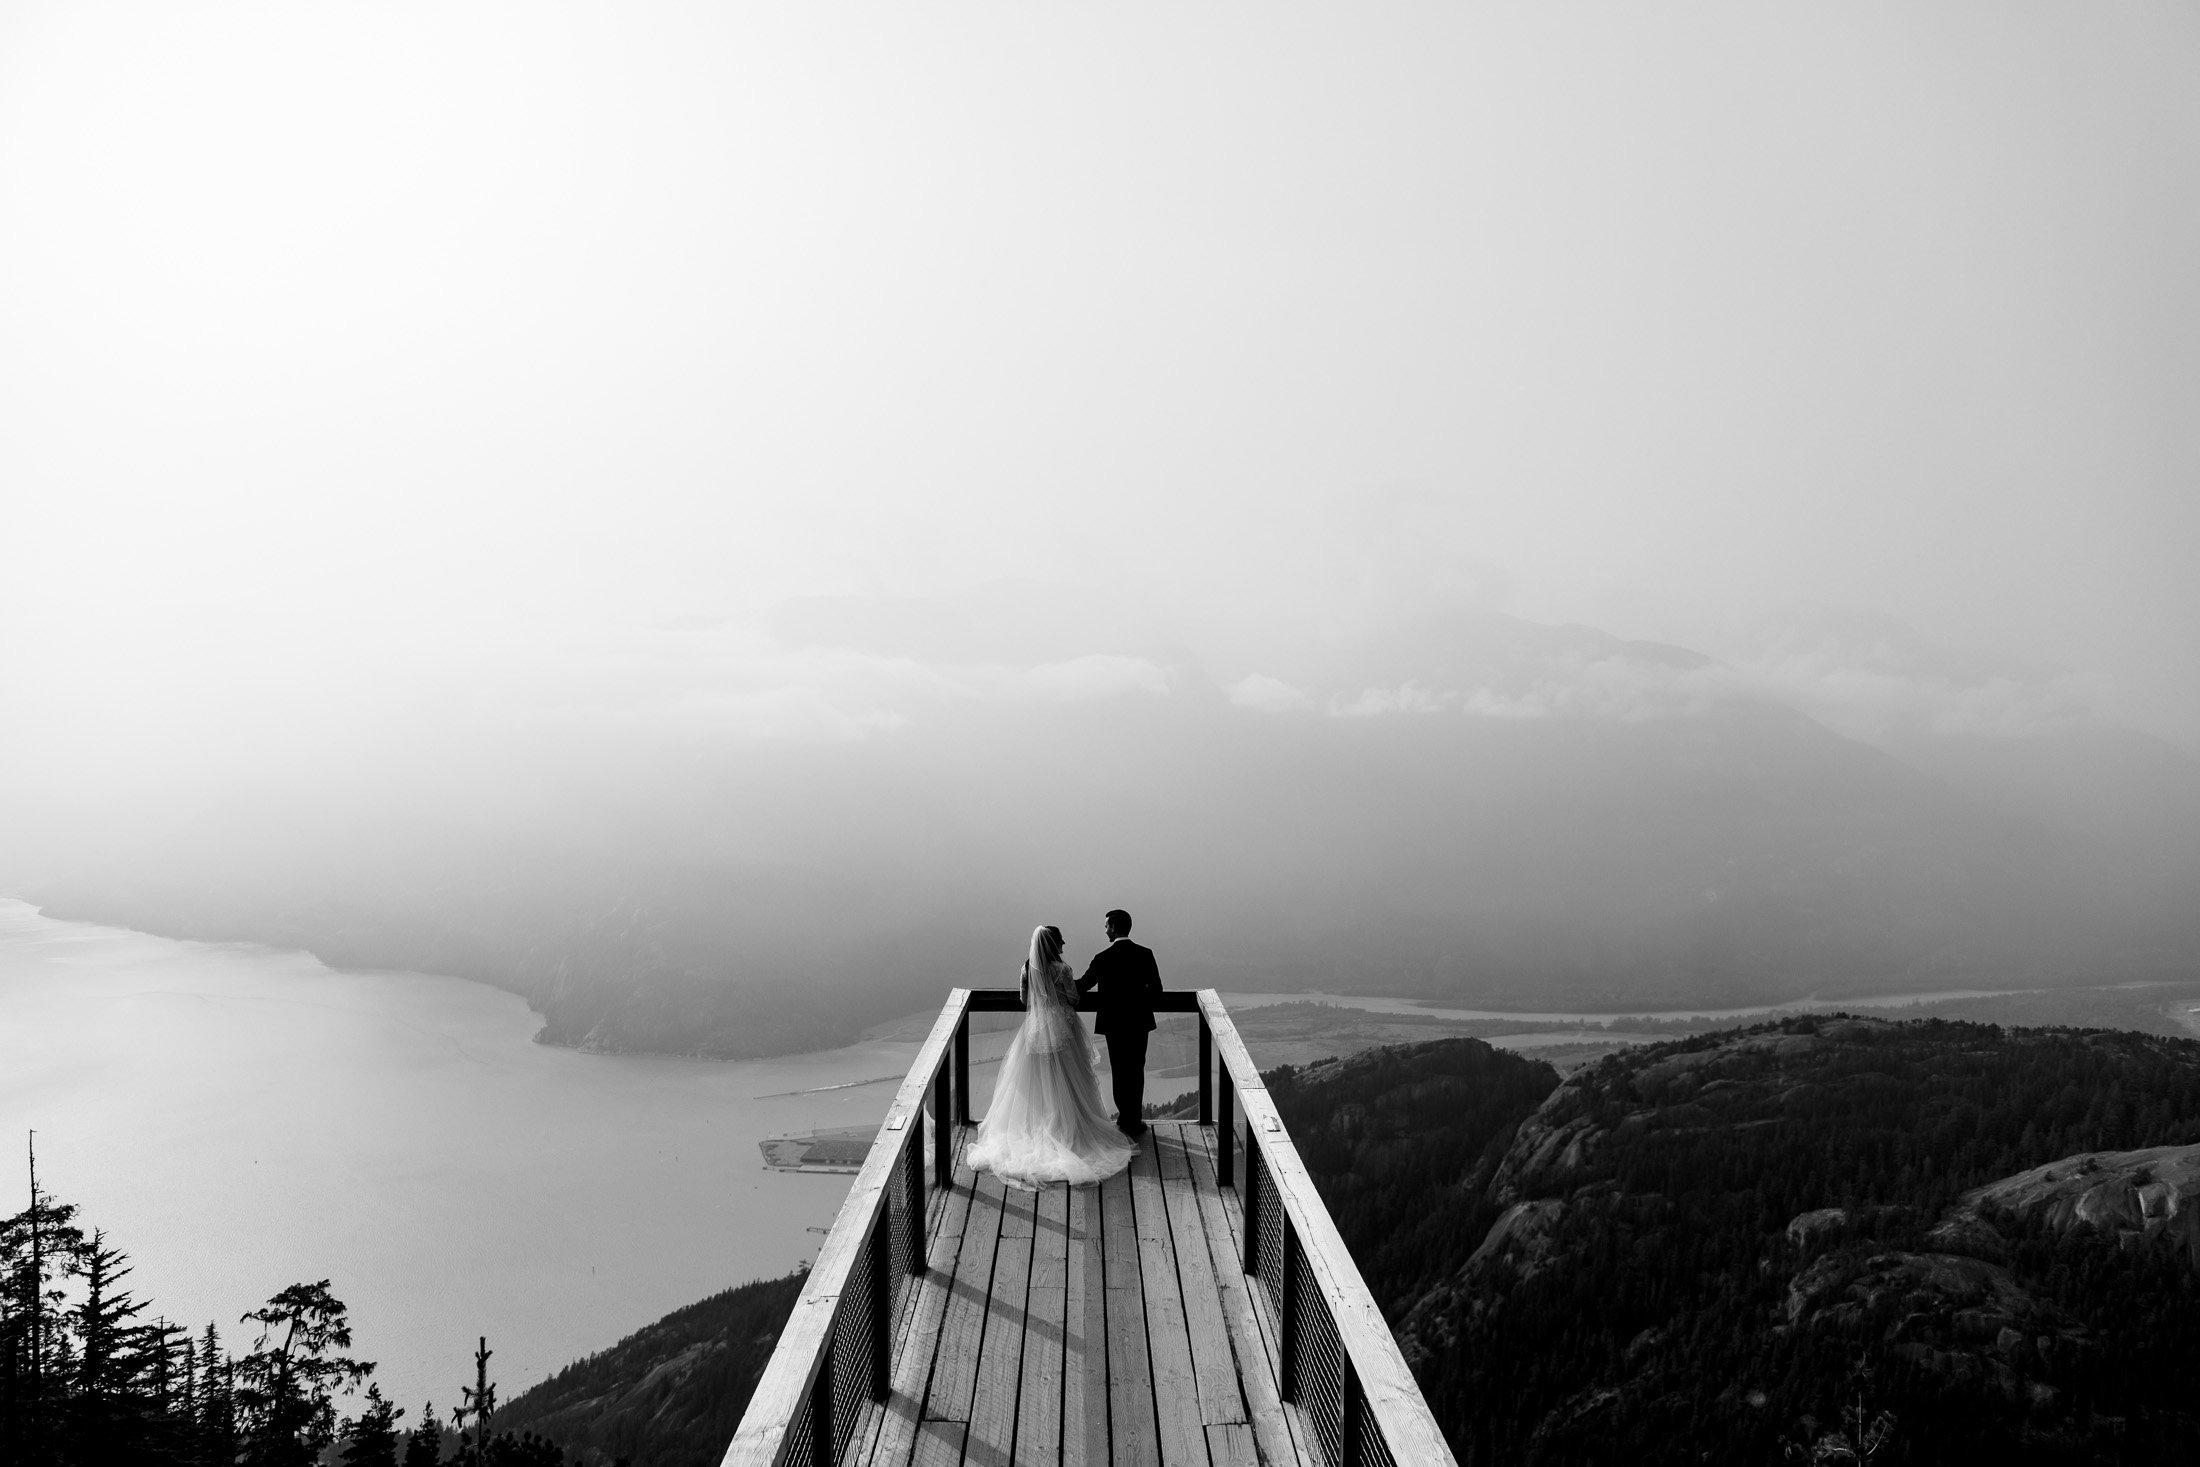 007 - best wedding photo location vancouver